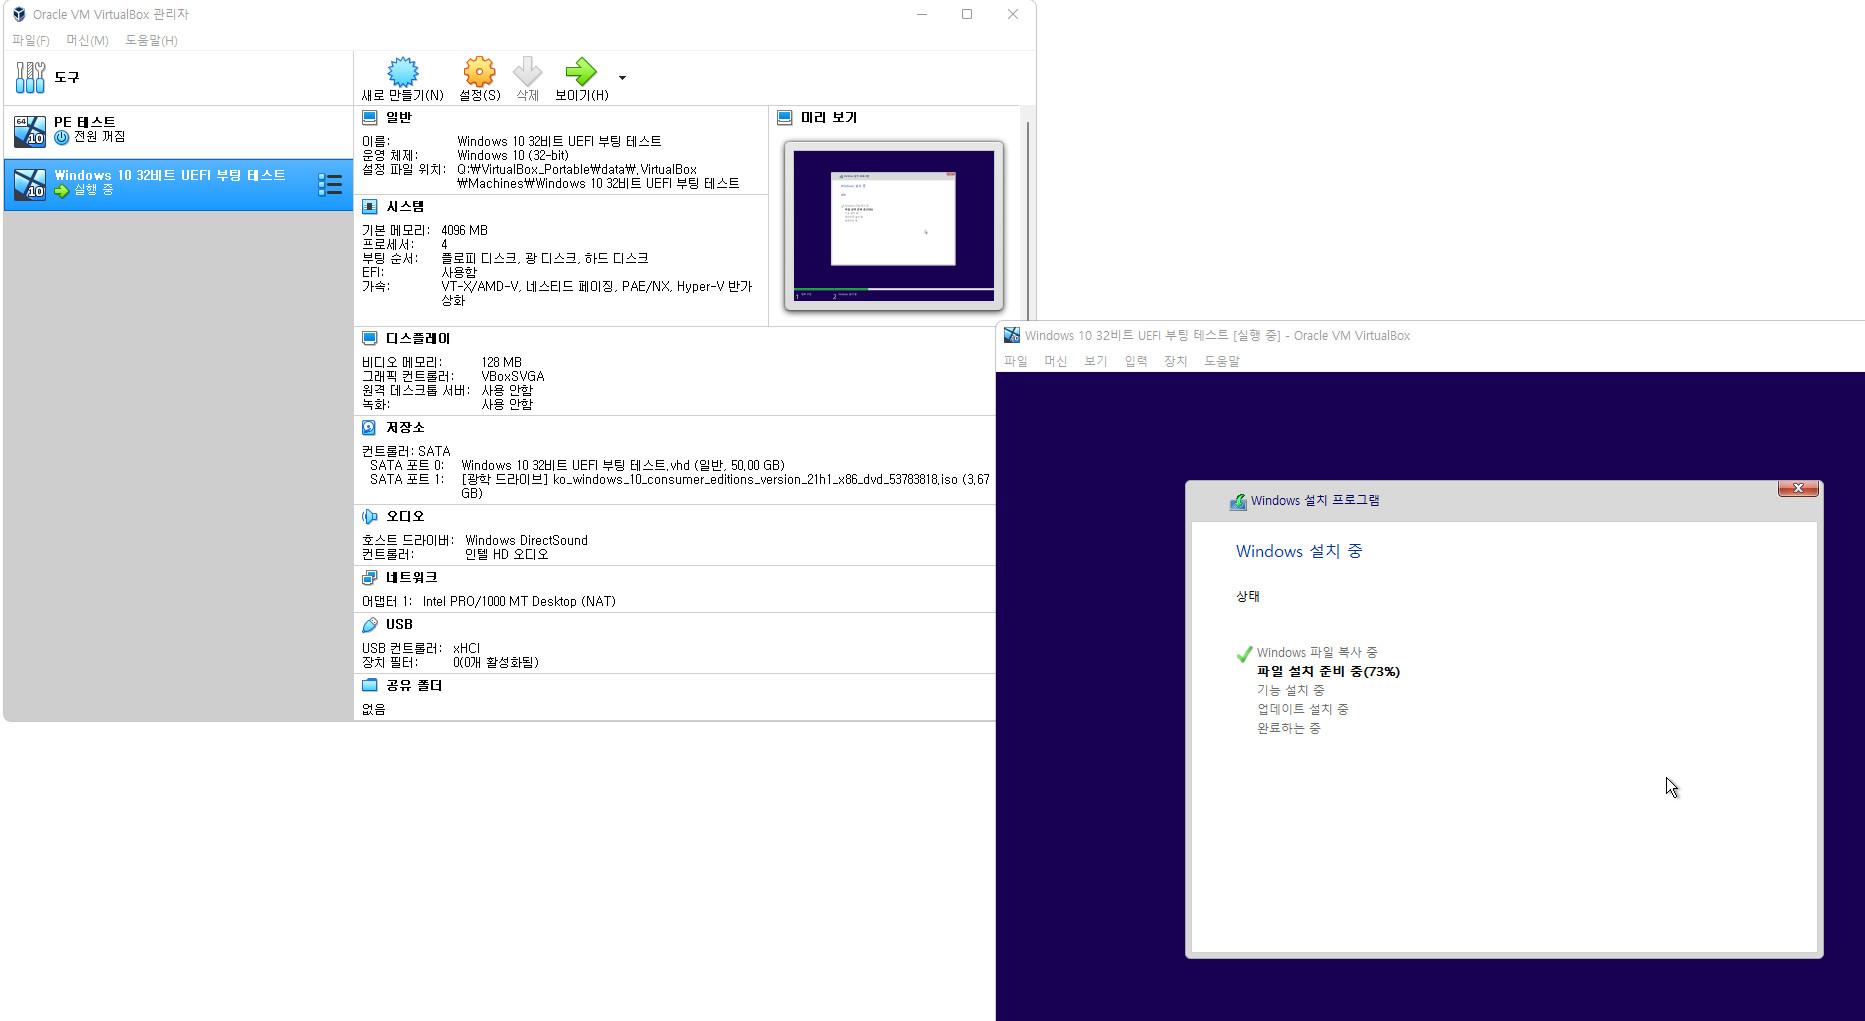 UEFI 부팅은 원래 32비트도 됩니다. 실컴은 메인보드 차원에서 32비트는 제한이 된 것 뿐입니다 - 가상머신에서는 32비트도 UEFI 됩니다 2021-09-08_143222.jpg